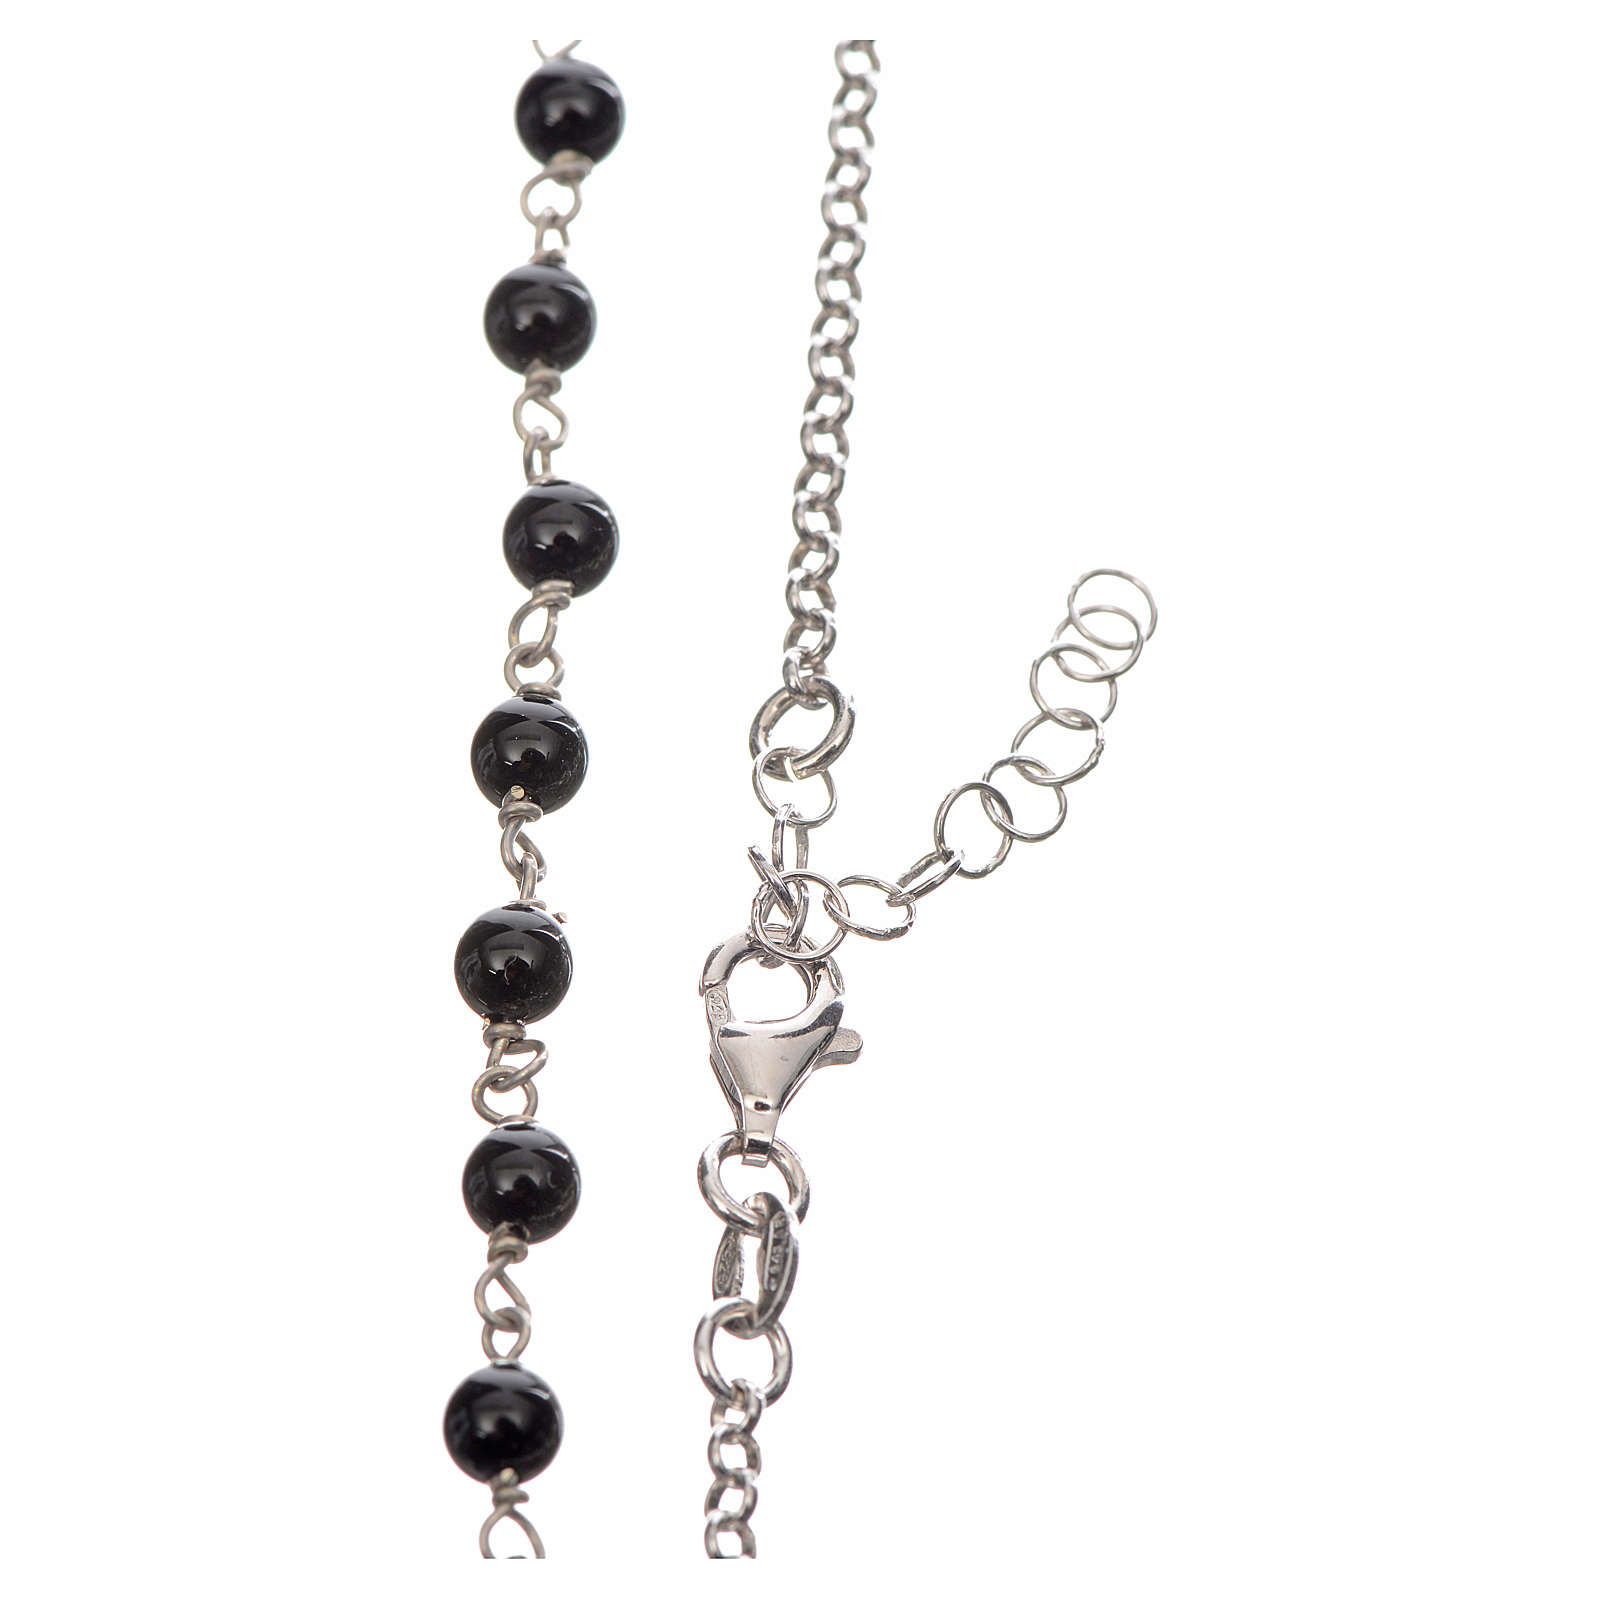 Collar MATER plata 925 perlas negras tau y medalla 4